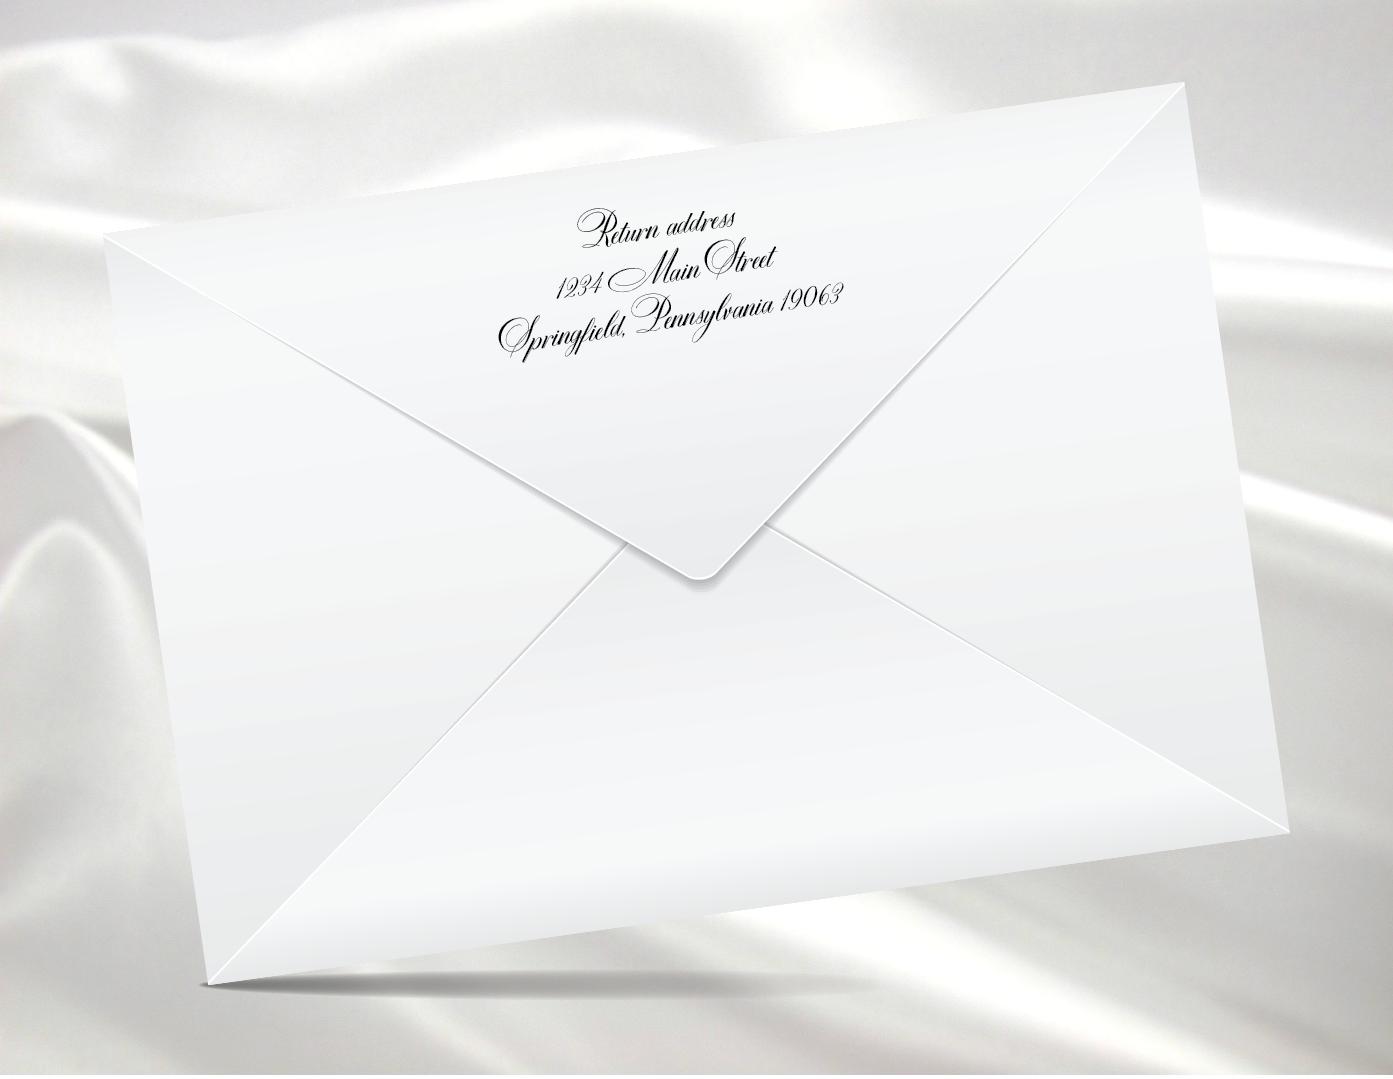 FIC_envelope_samples-02.png